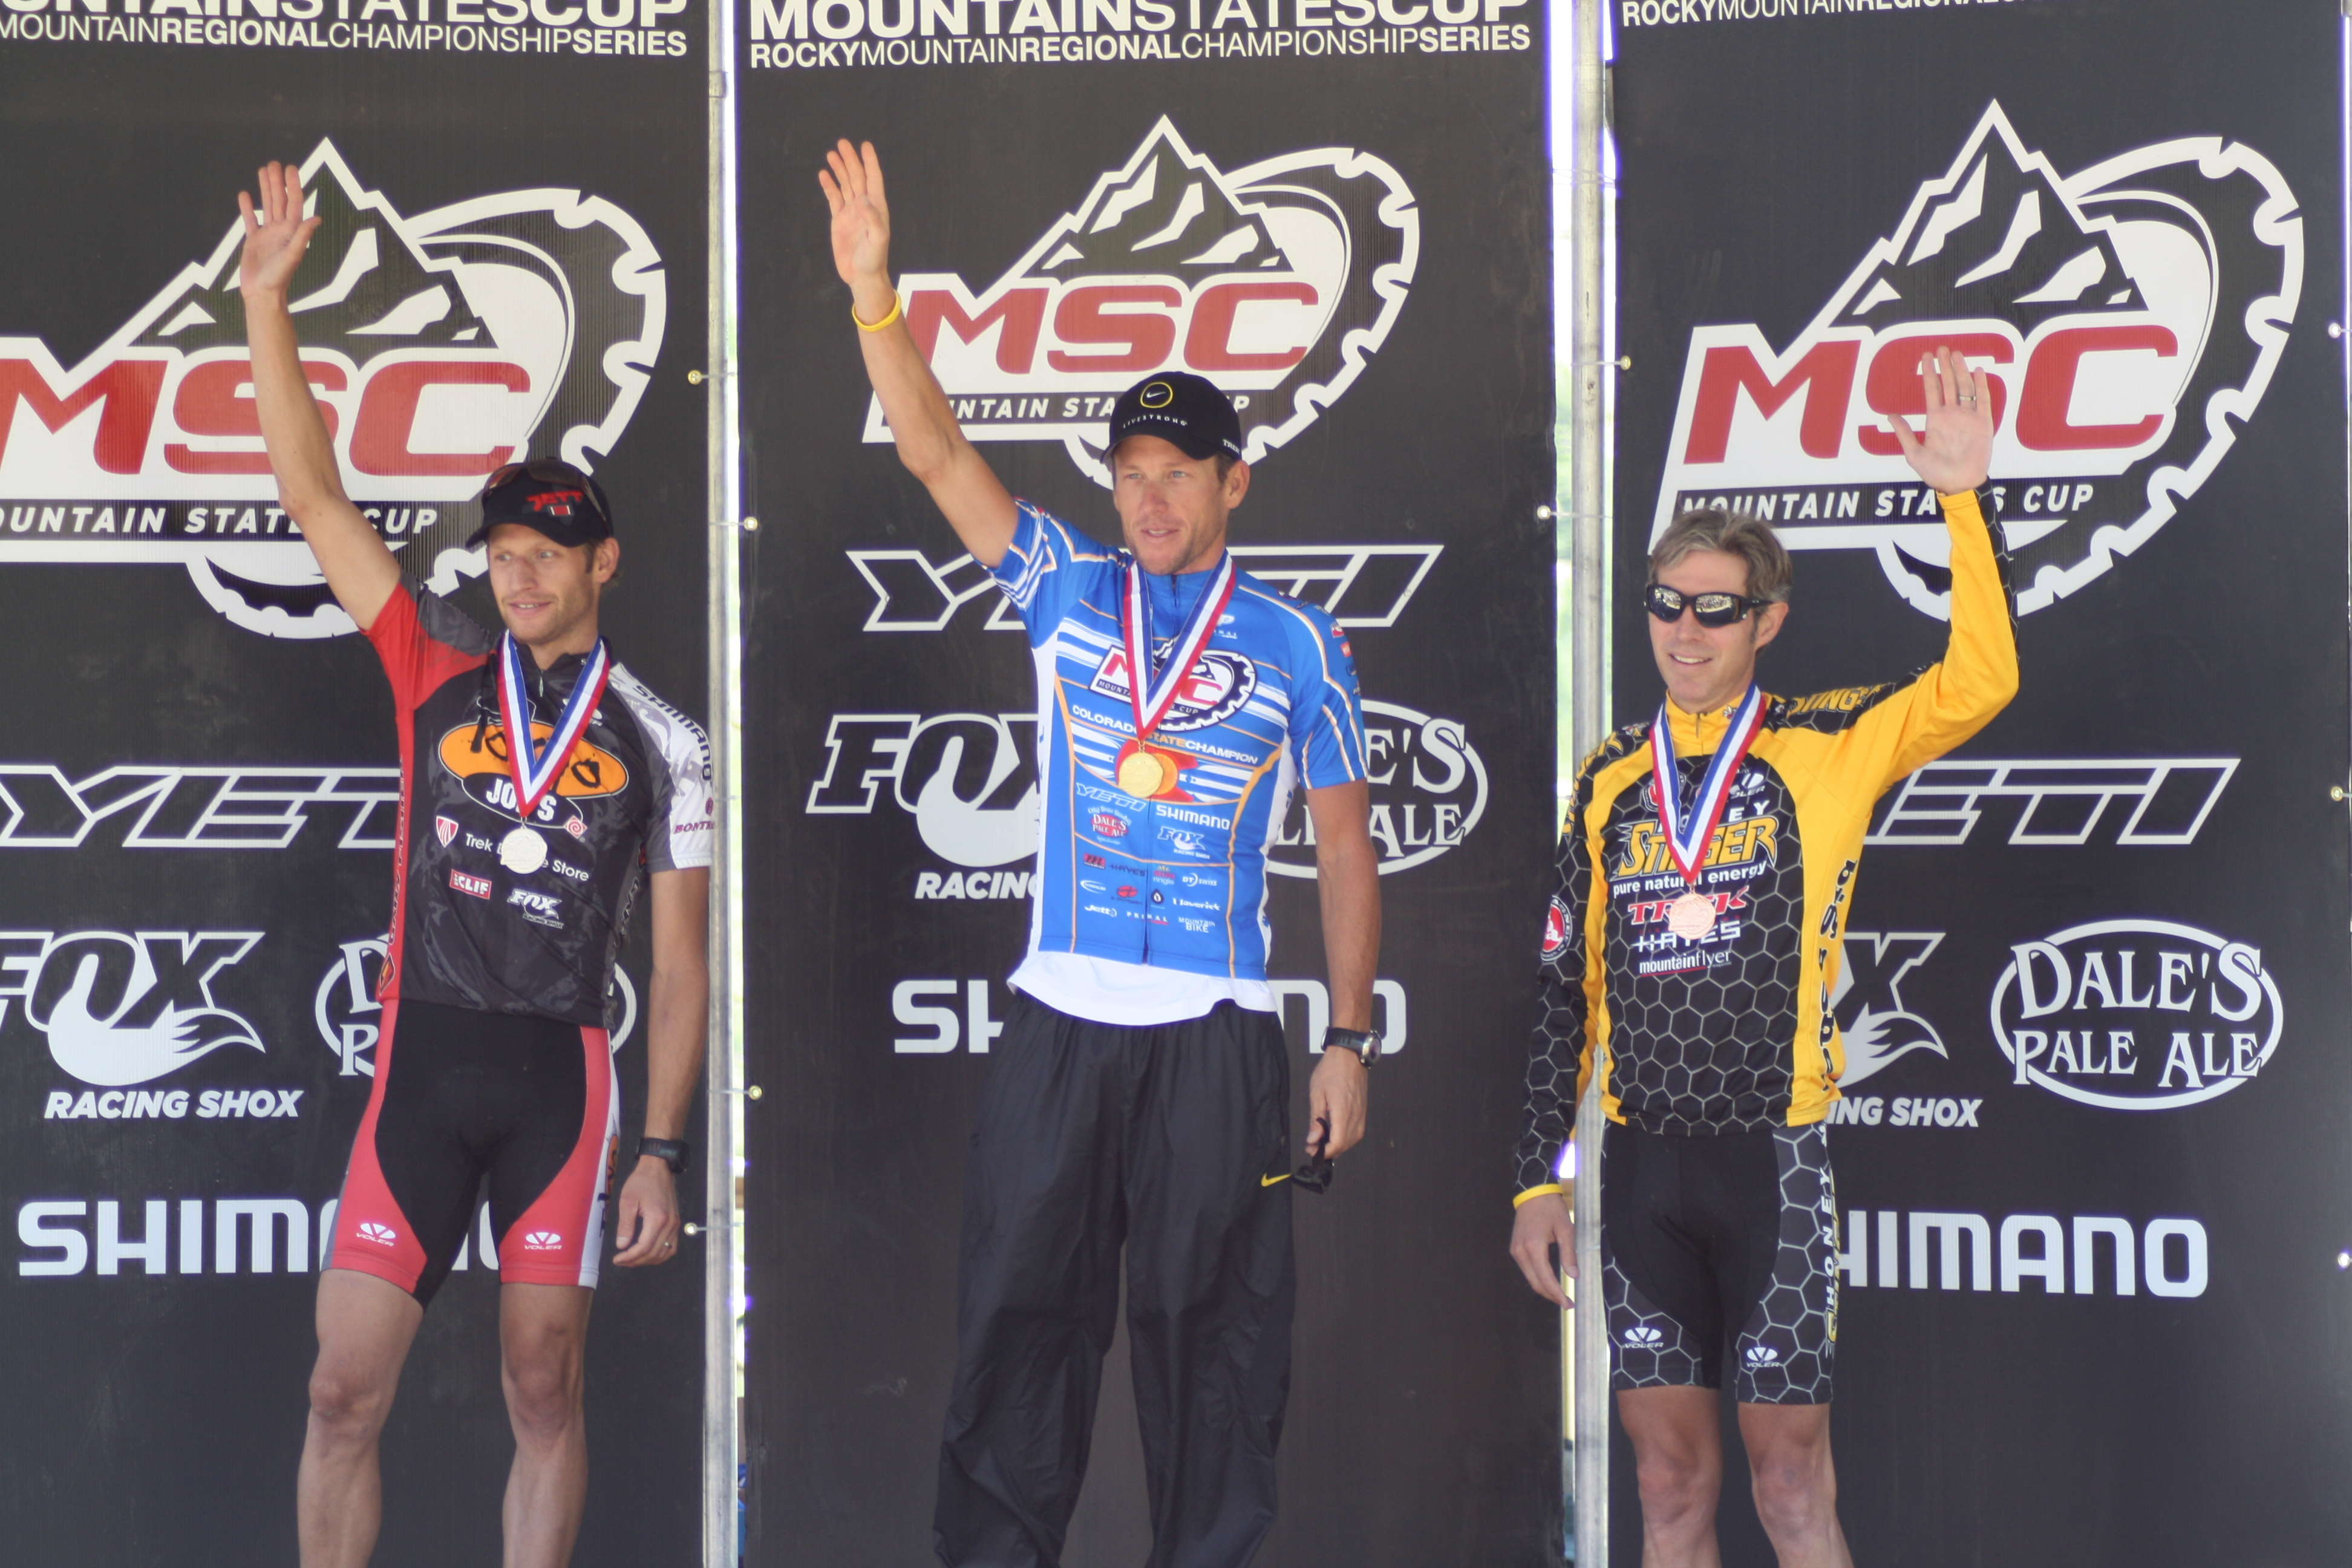 Jay Henry, Lance Armstrong & Len Zanni